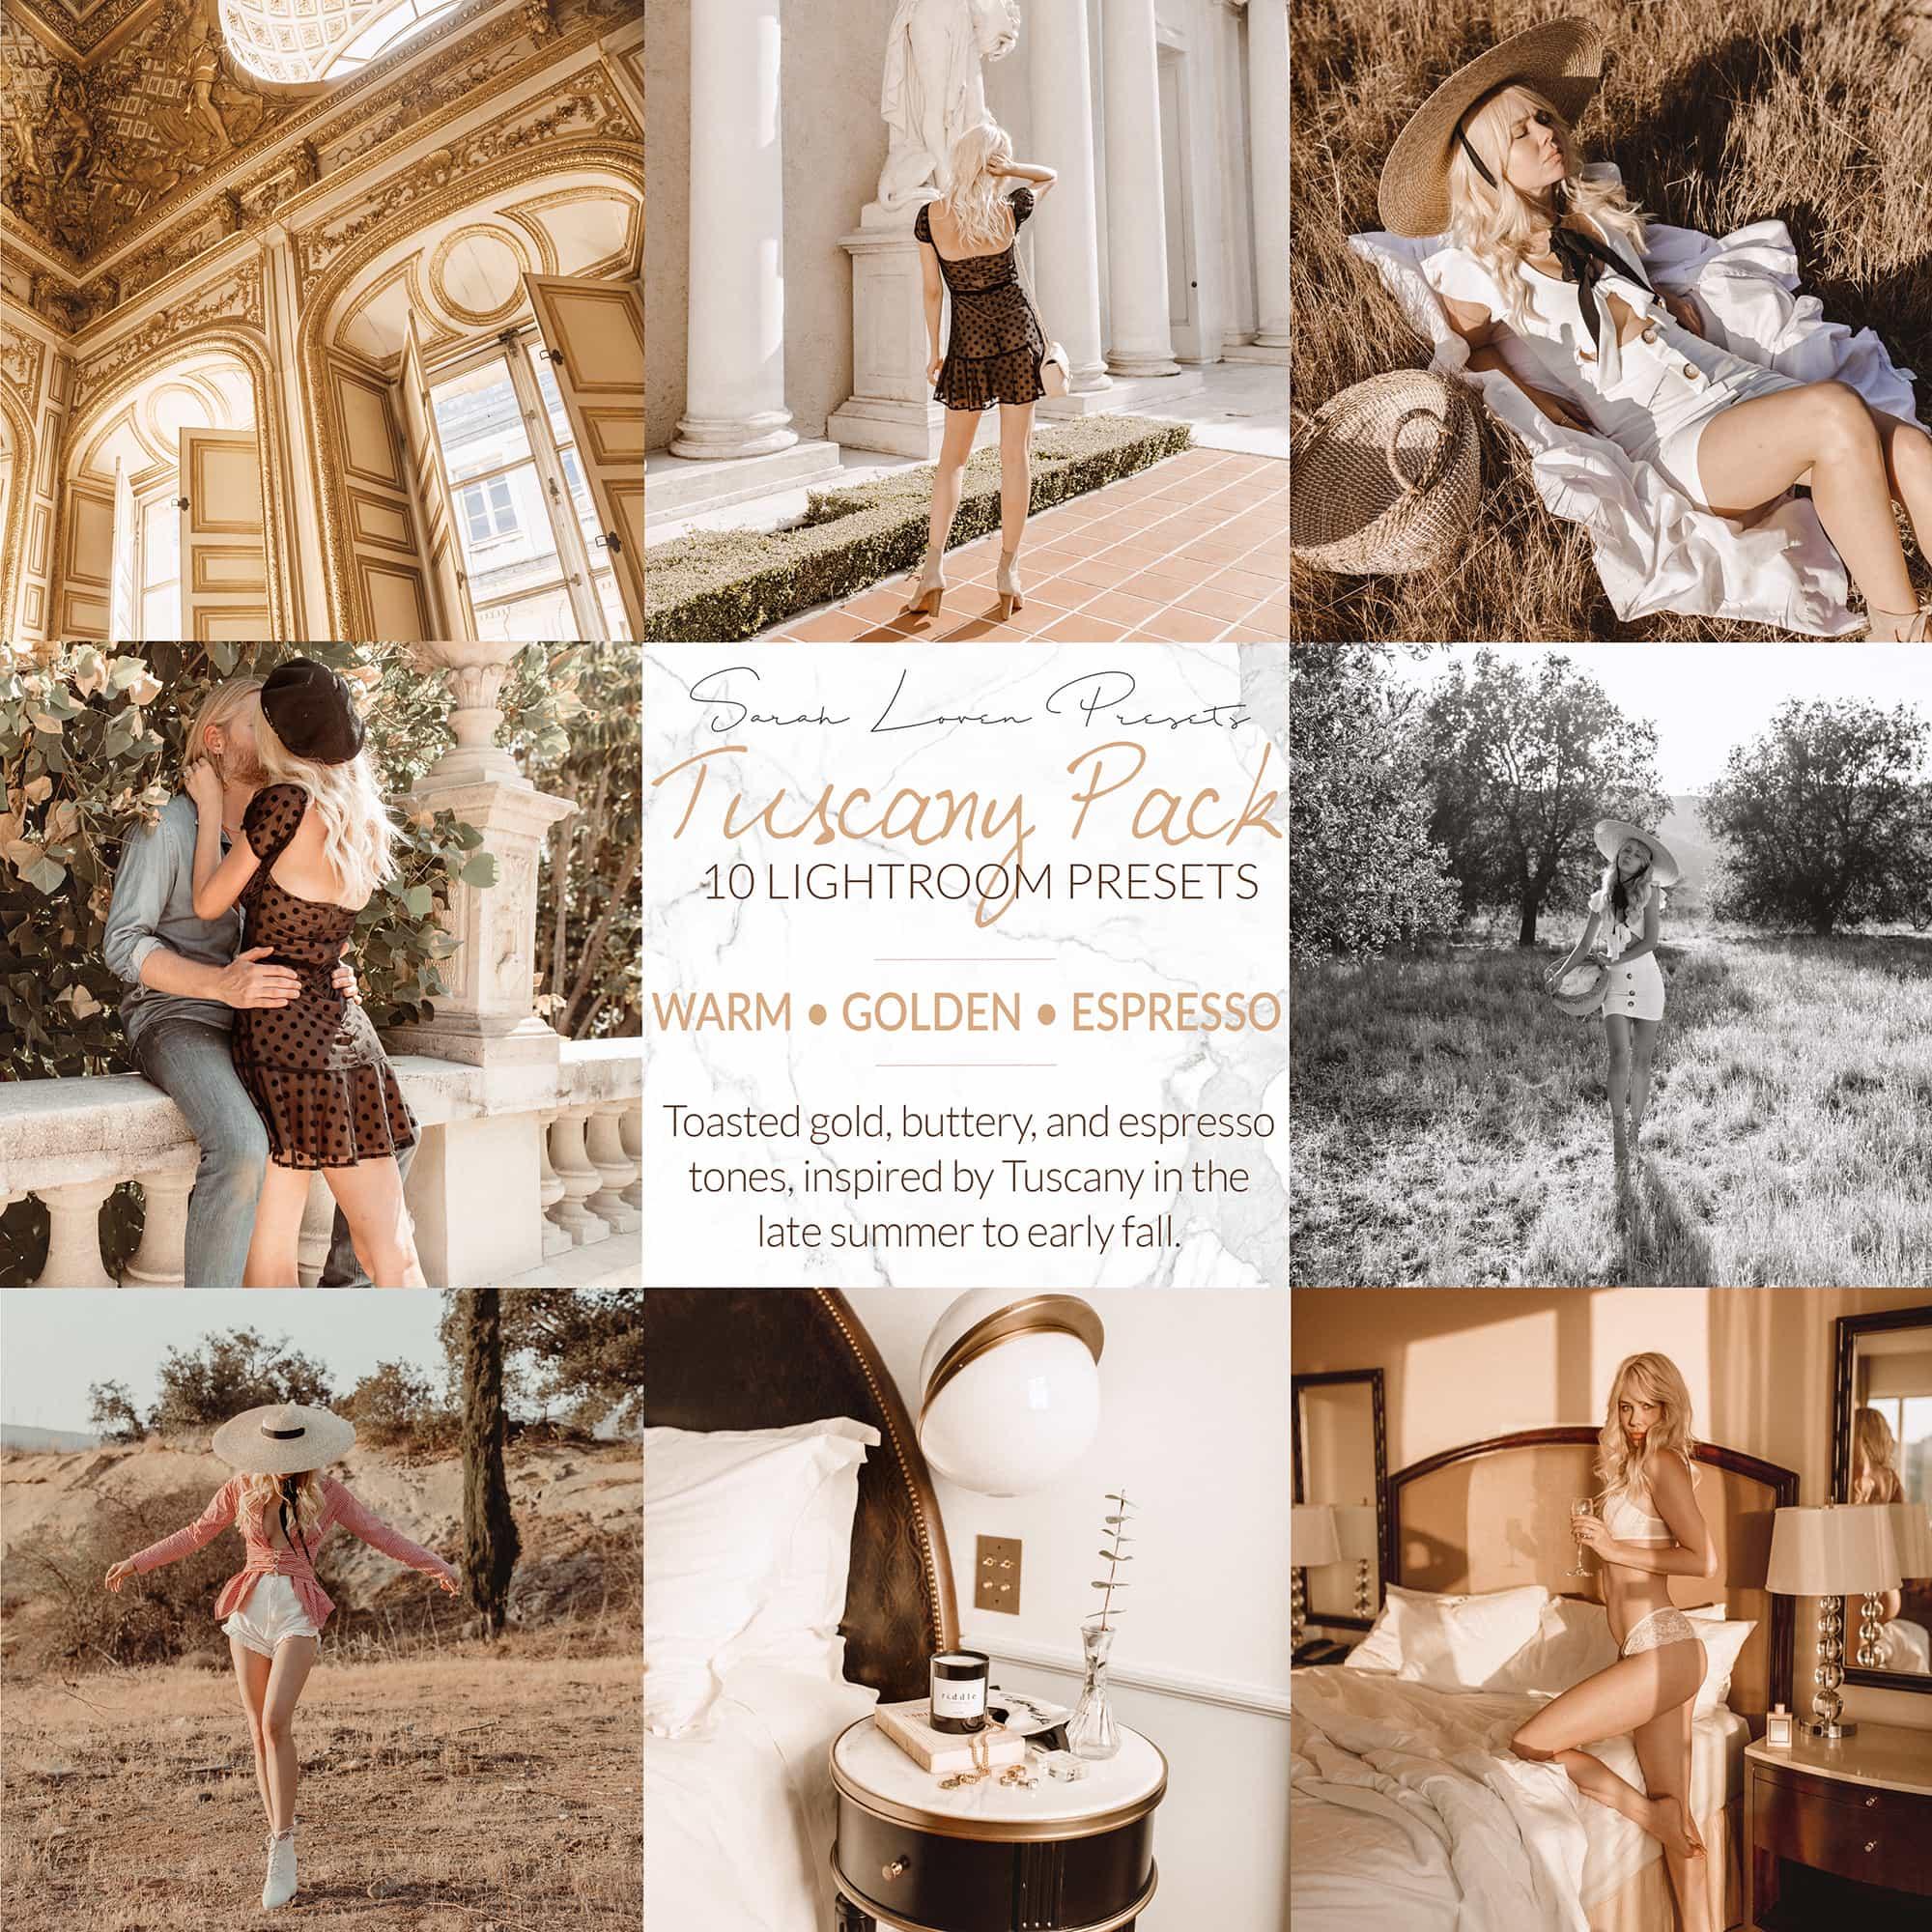 Sarah-Loven-Presets-Tuscany-Pack